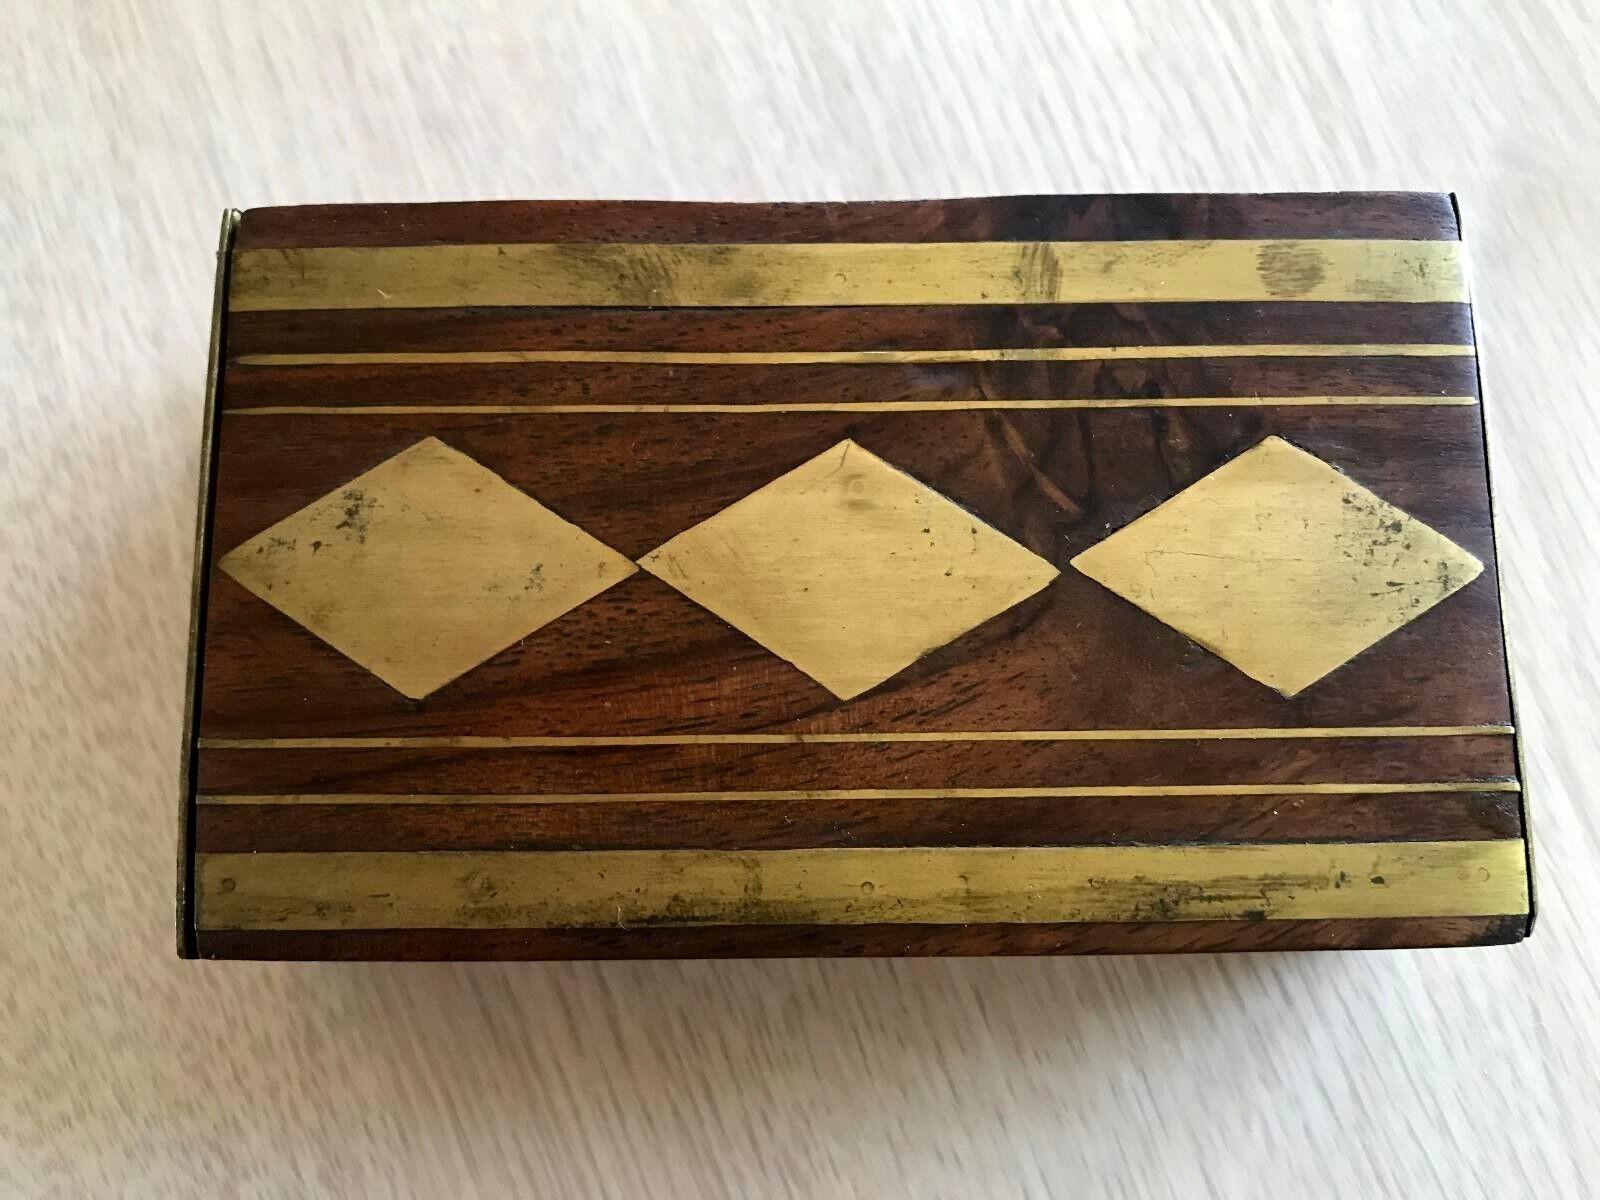 Wooden gold Decor Men's Jewelry Box 3 x5 x1 5  Original Box Concepts